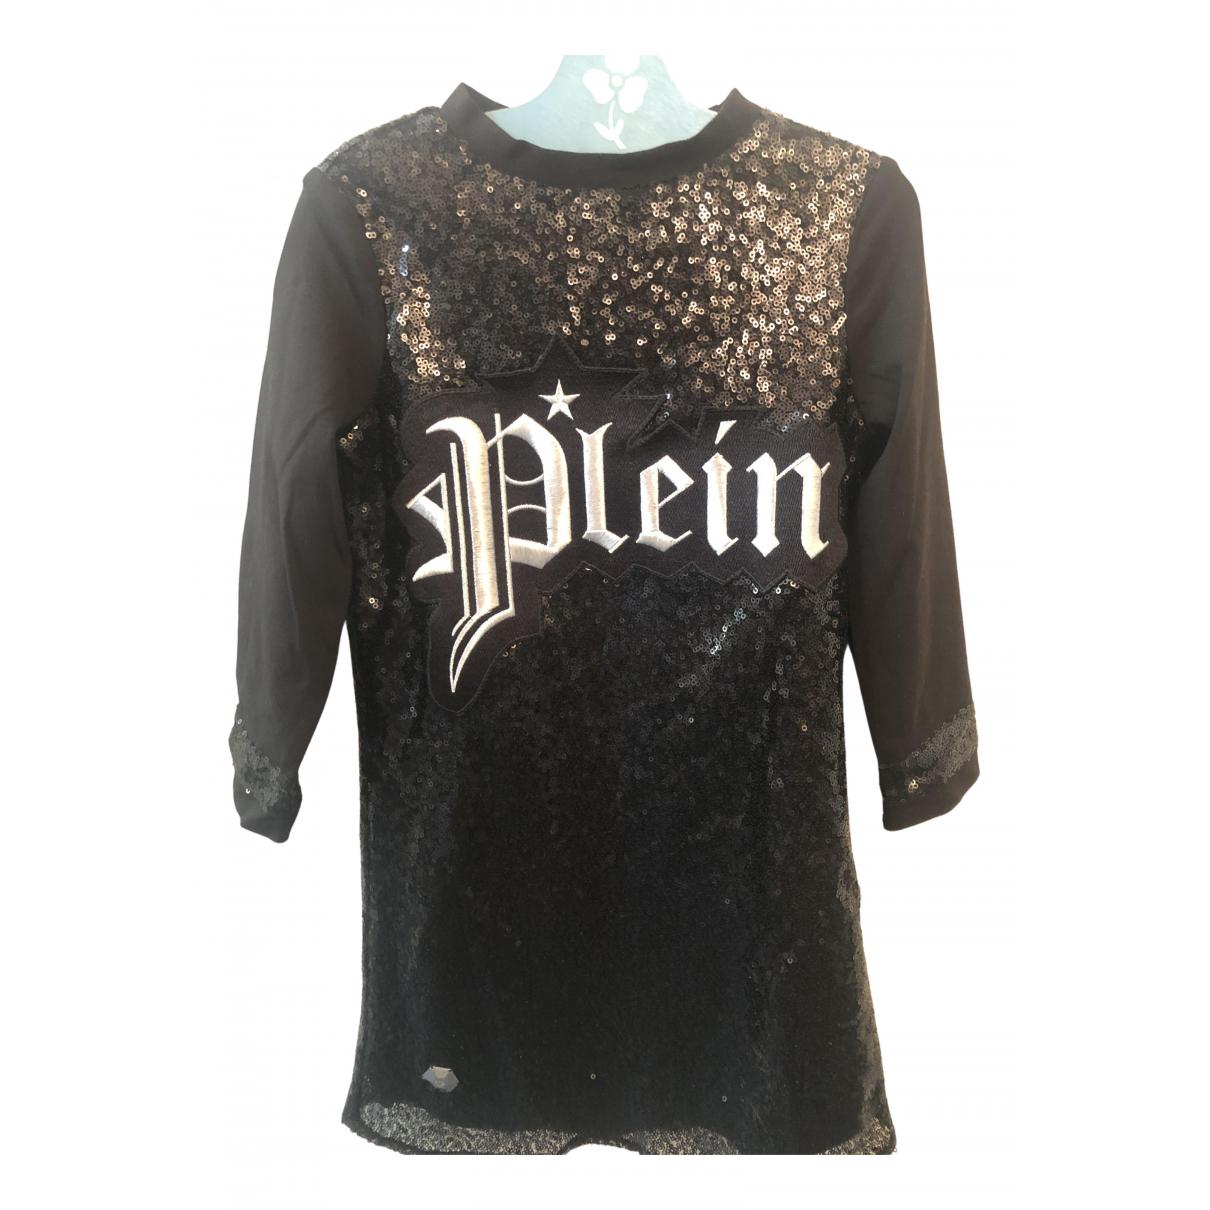 Philipp Plein N Black Glitter dress for Kids 6 years - up to 114cm FR